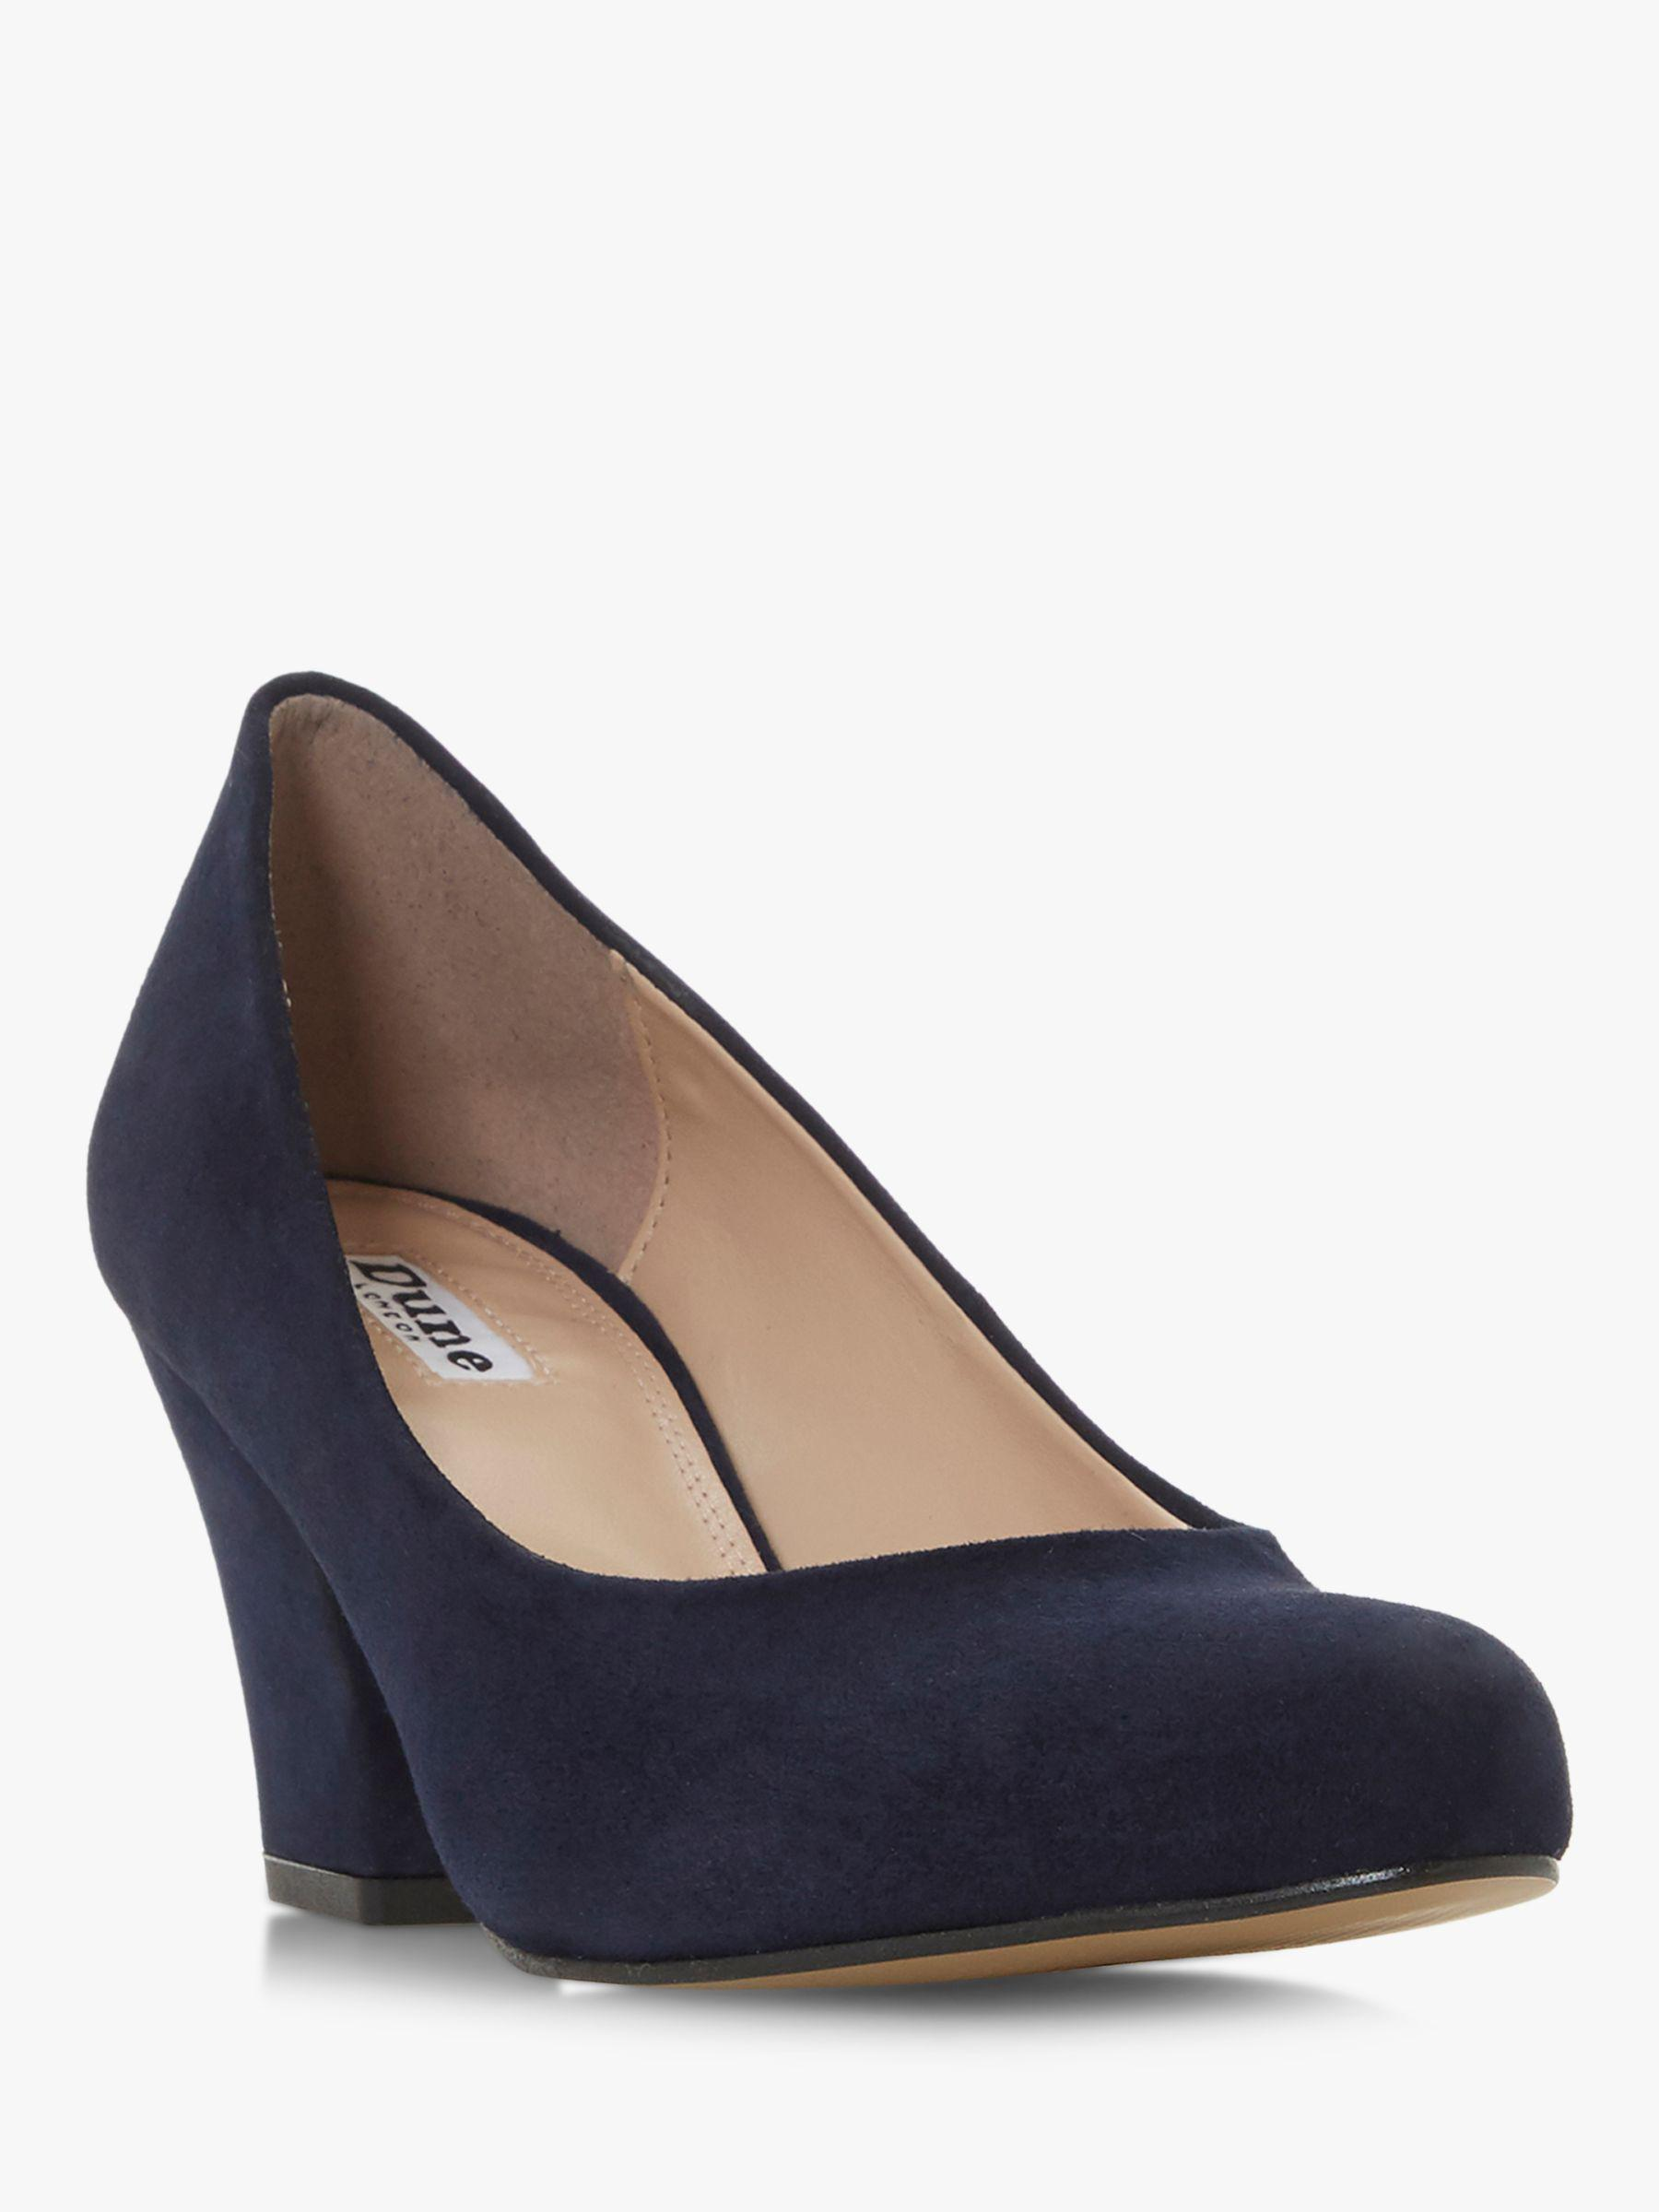 d0b6b99d7d2 Dune Anthea Mid Heel Court Shoes in Blue - Lyst